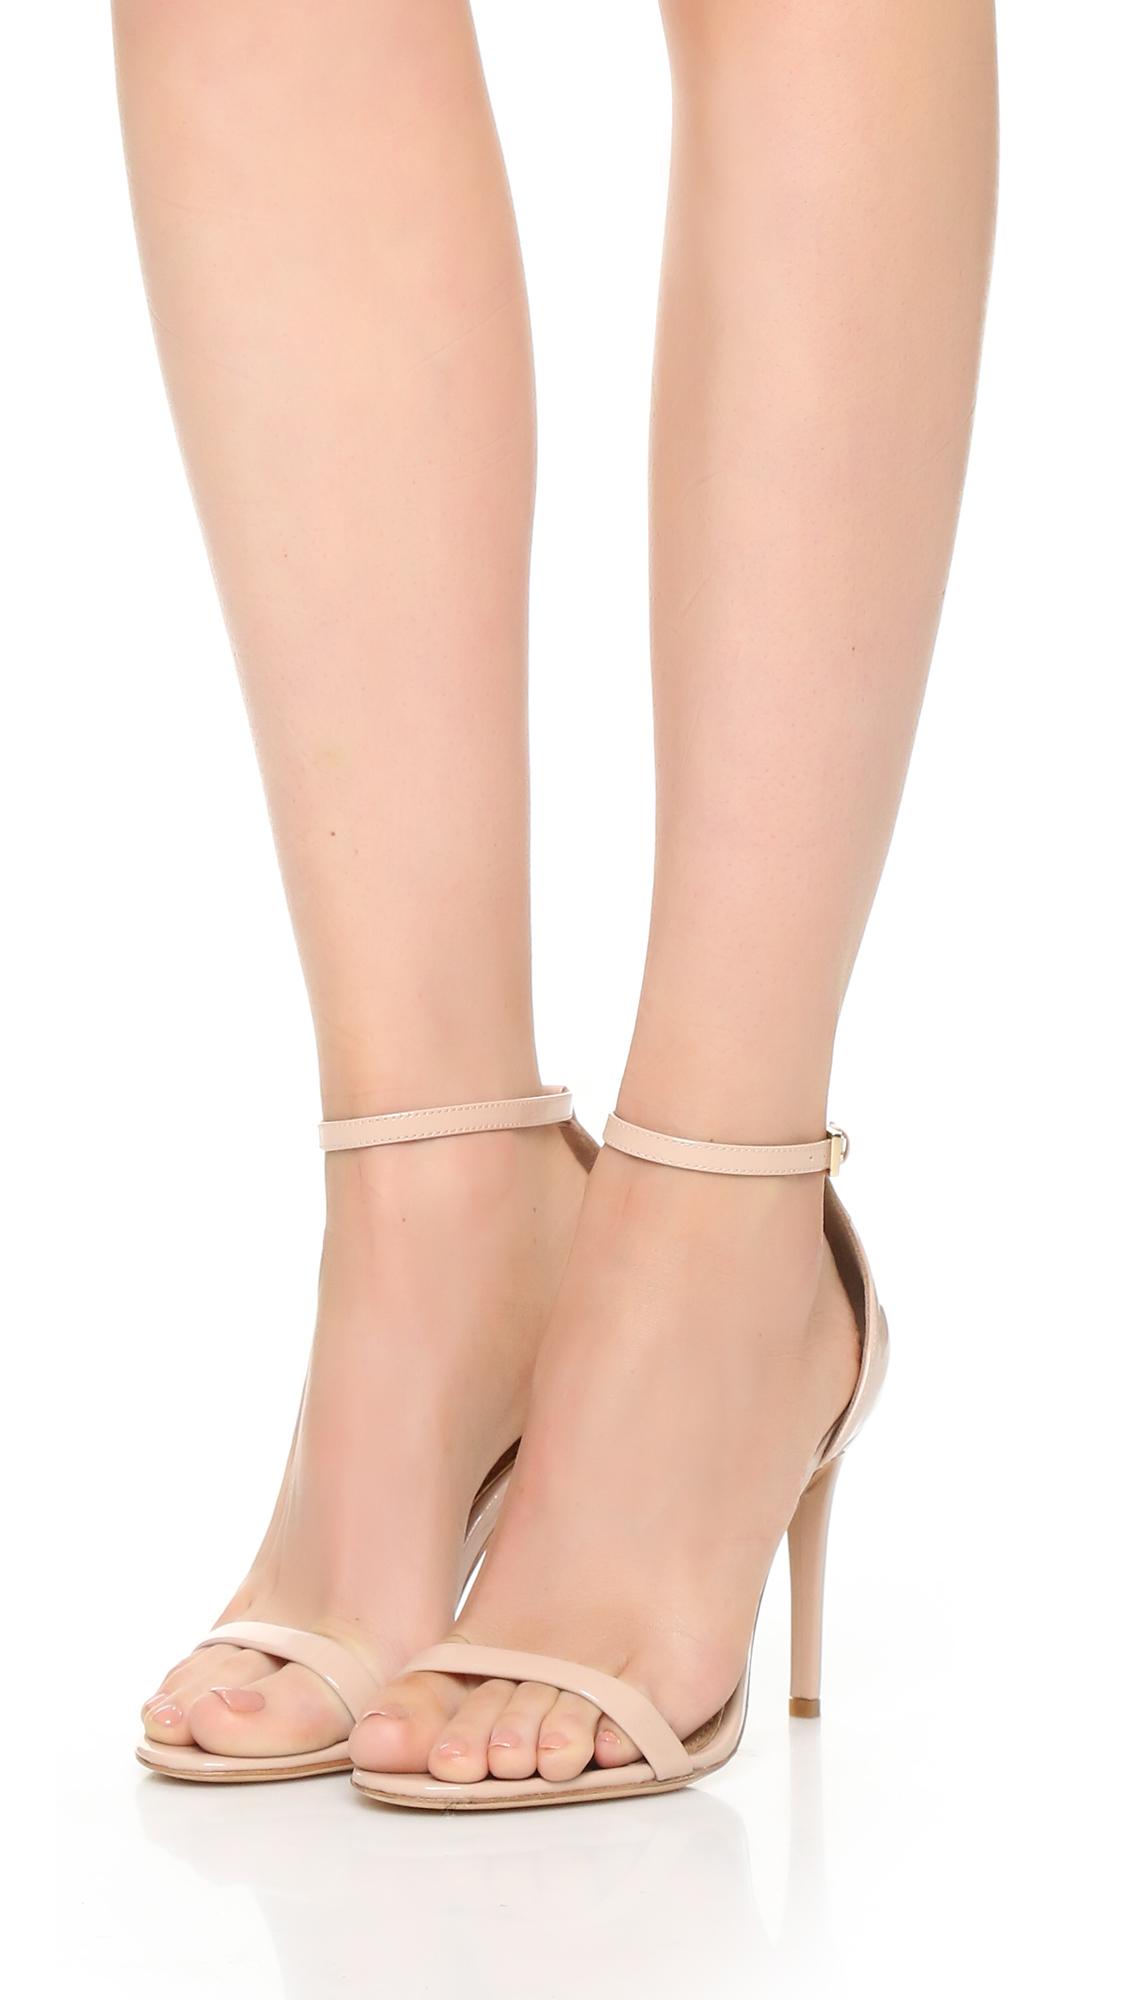 Rachel Zoe Ema Metallic Leather Stiletto Sandal MnA8r